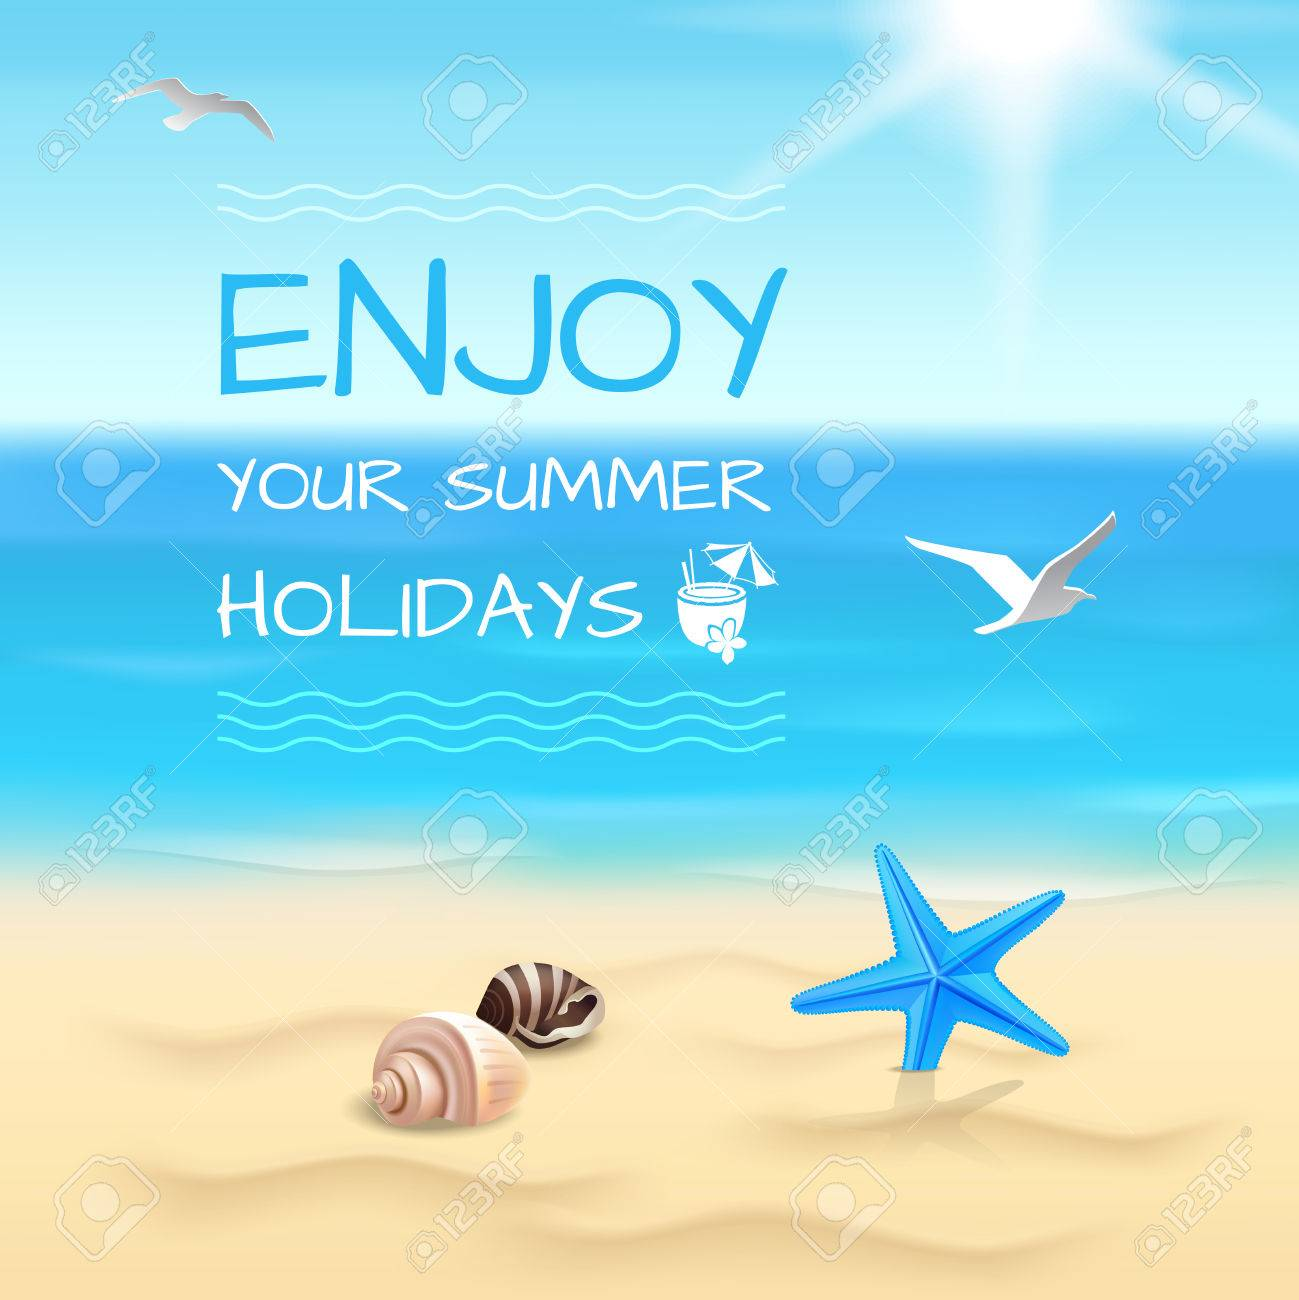 summer holidays seaside beach background enjoy your summer holidays